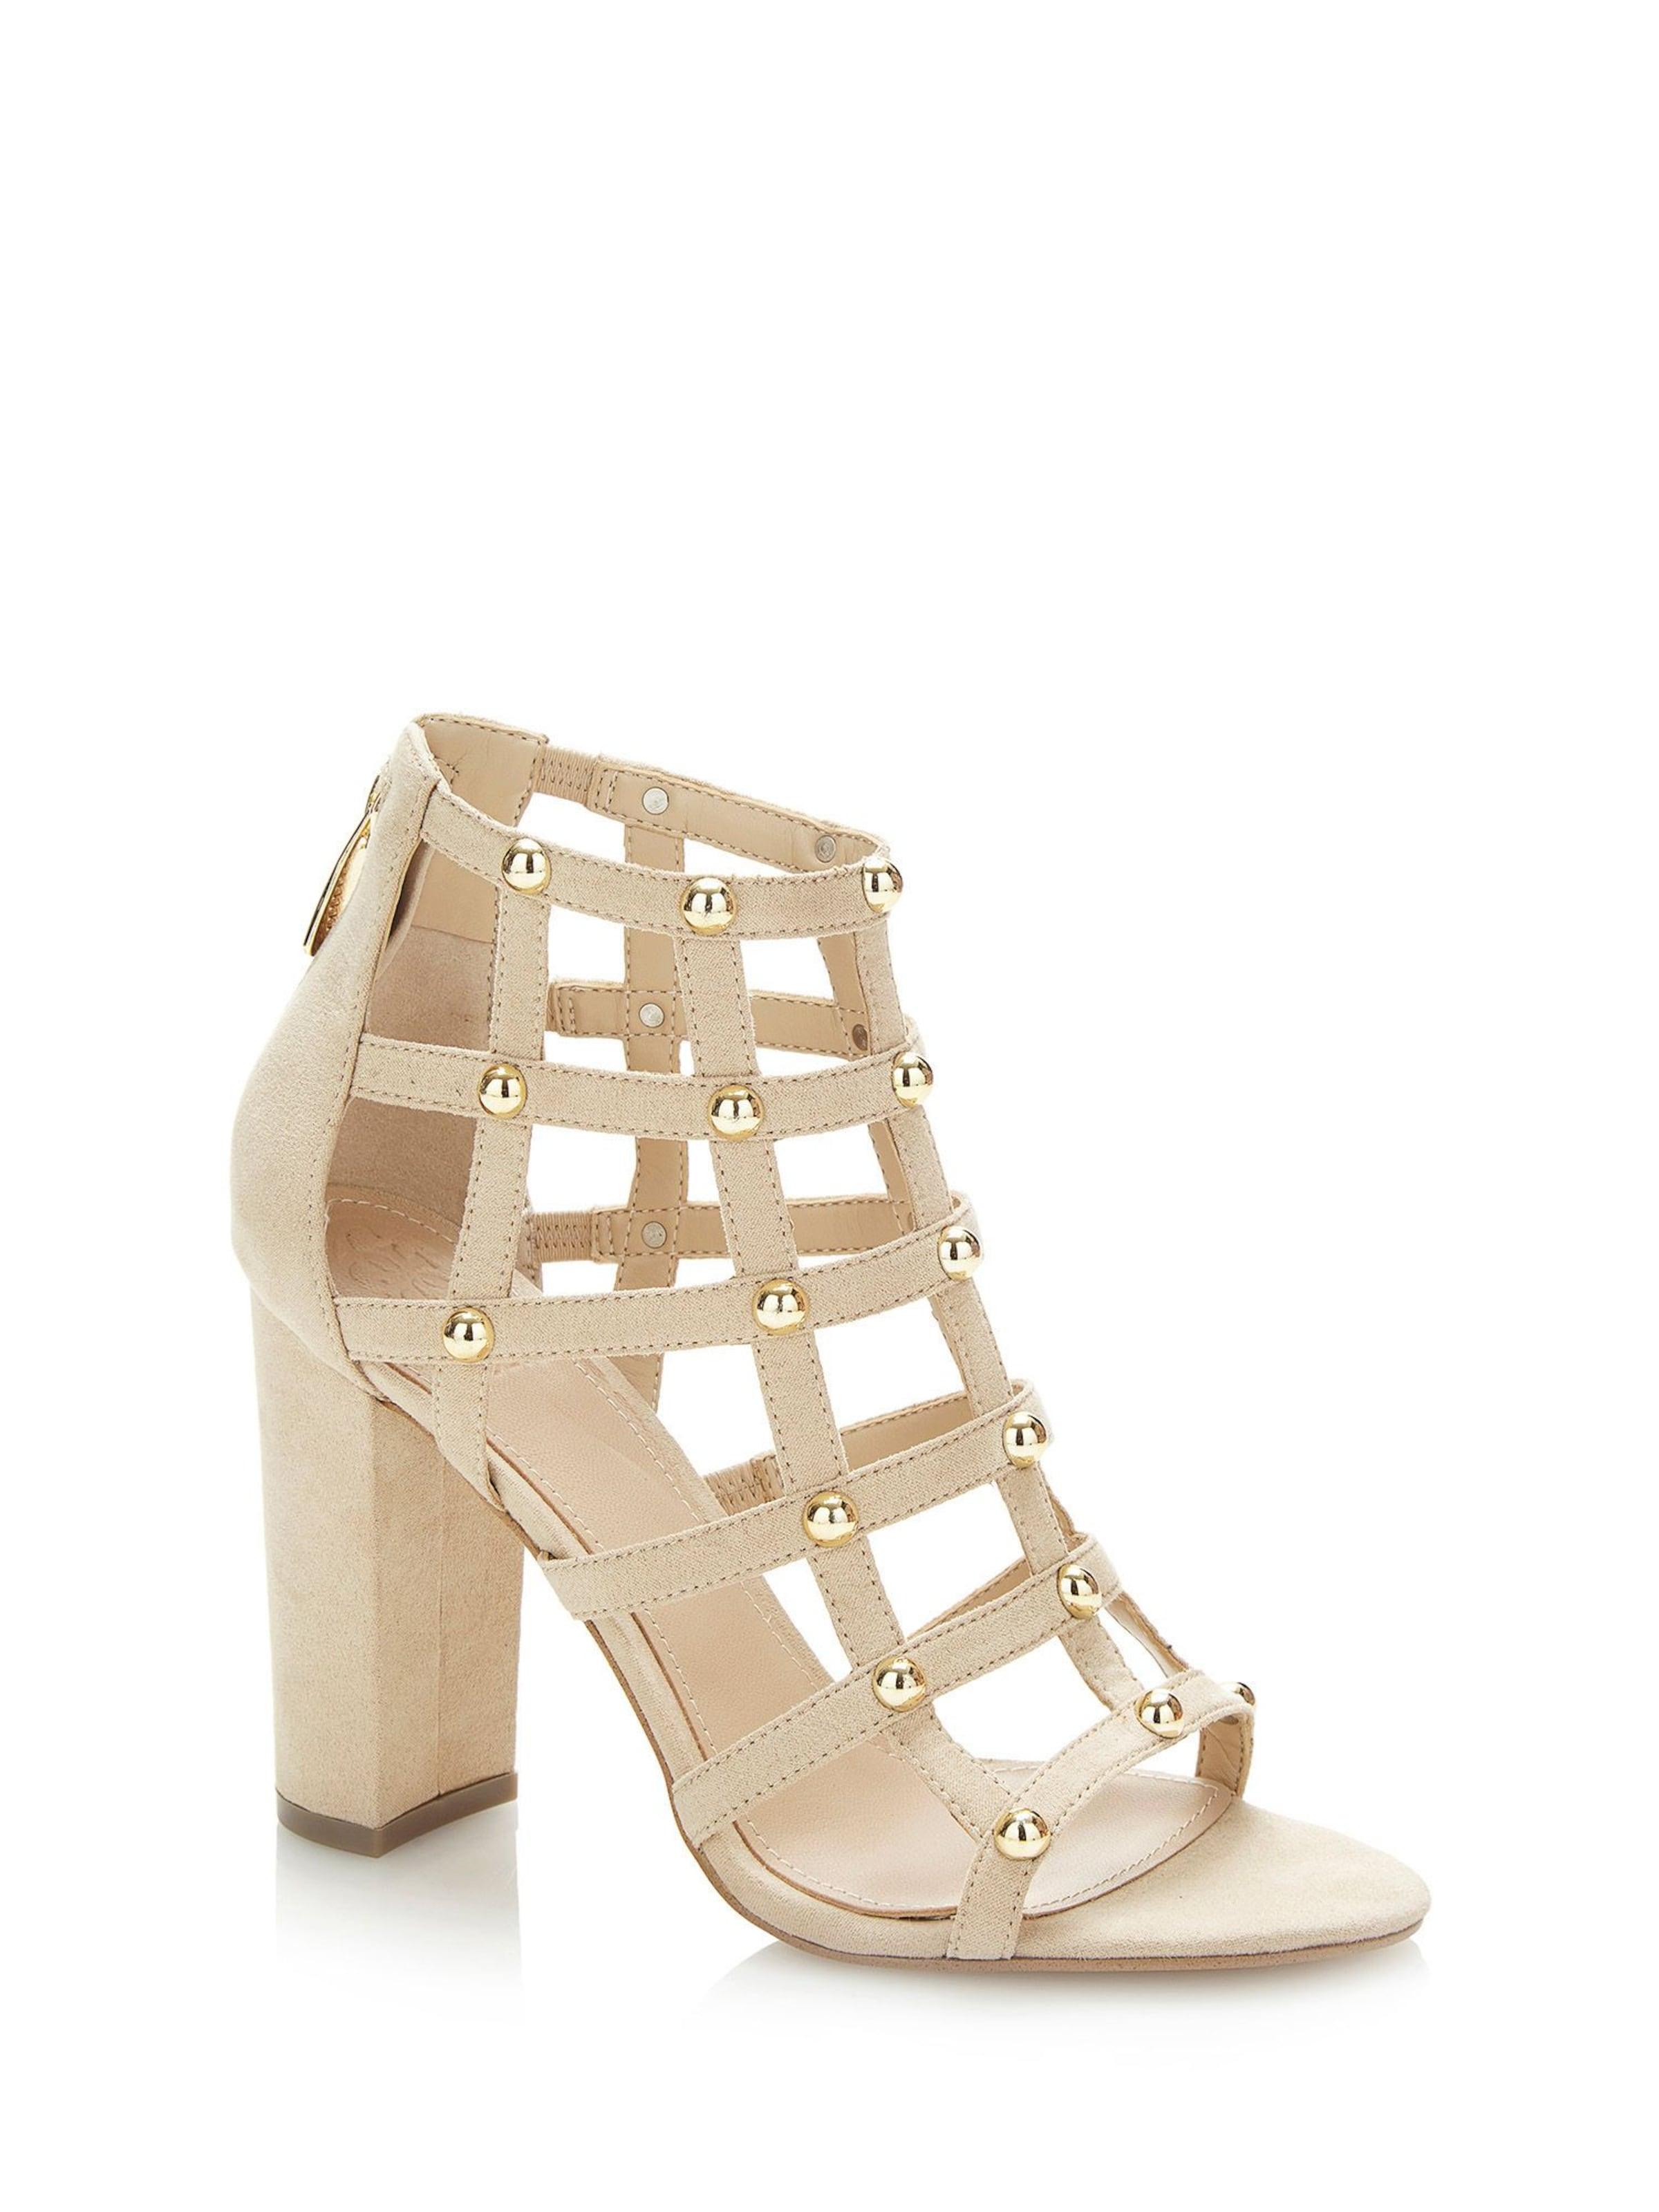 Haltbare Mode billige Schuhe GUESS | Sandalette Schuhe 'ACKLEY' Schuhe Gut getragene Schuhe Sandalette 1fb15a